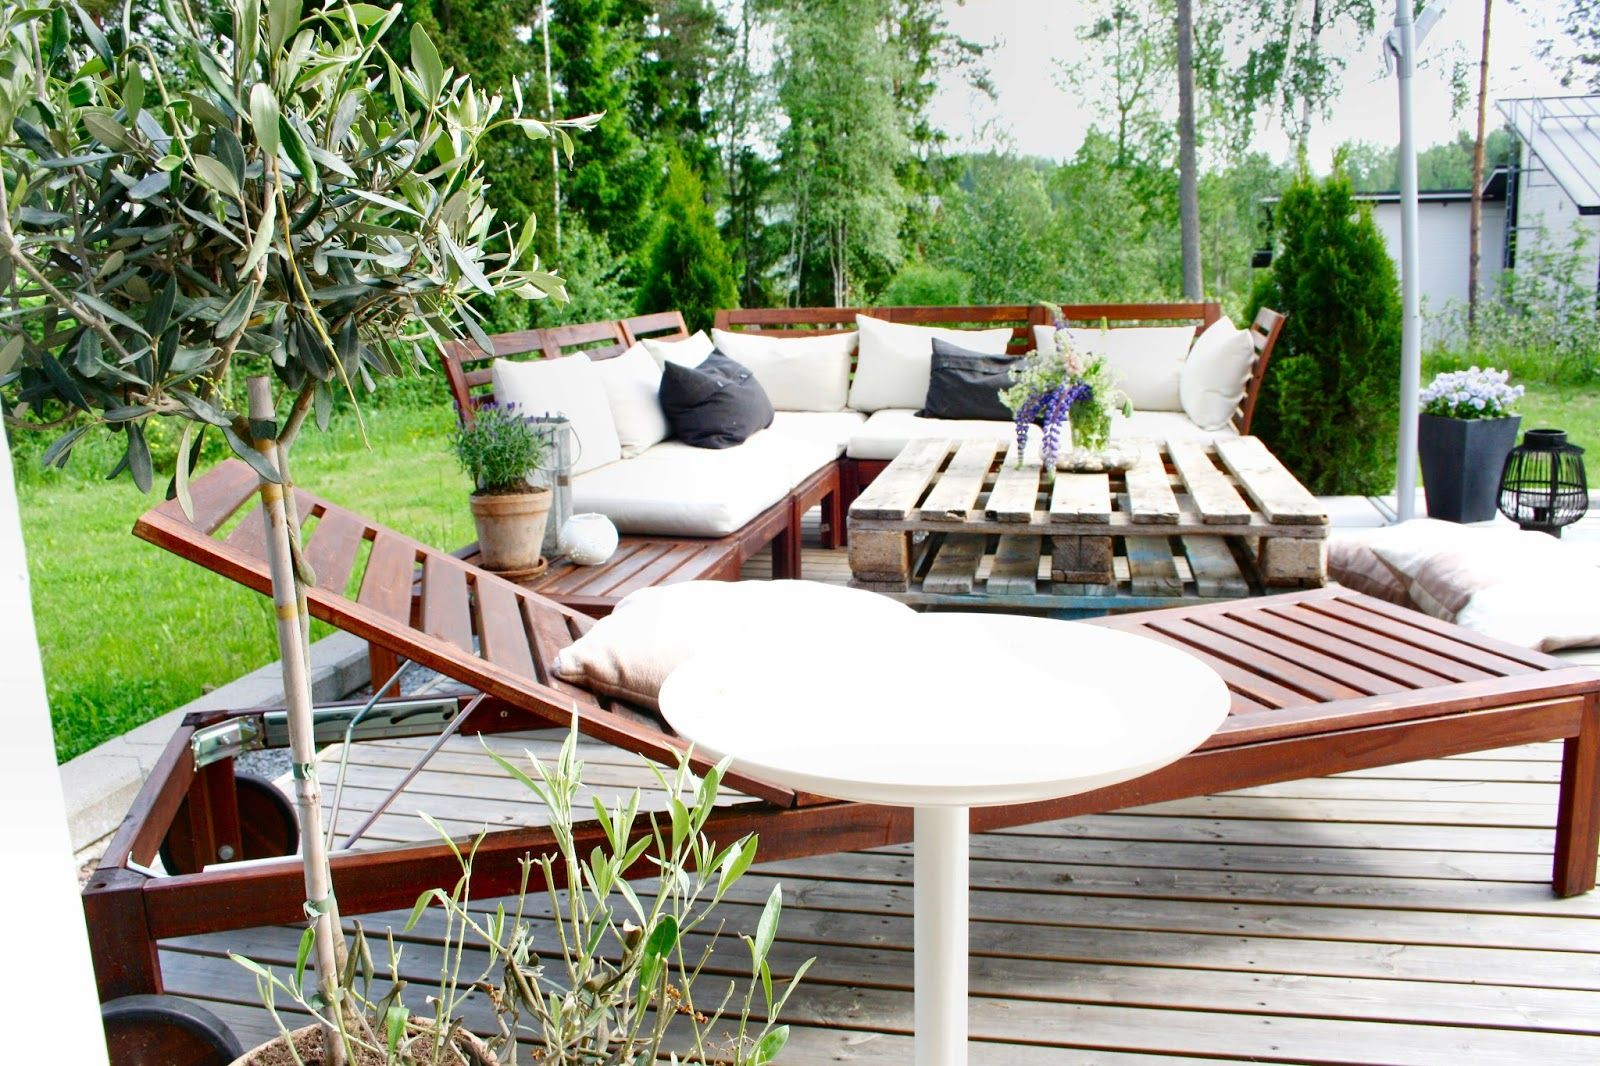 terrace patio garden ikea pplar olivtr d idahhh blog pinterest gardens. Black Bedroom Furniture Sets. Home Design Ideas